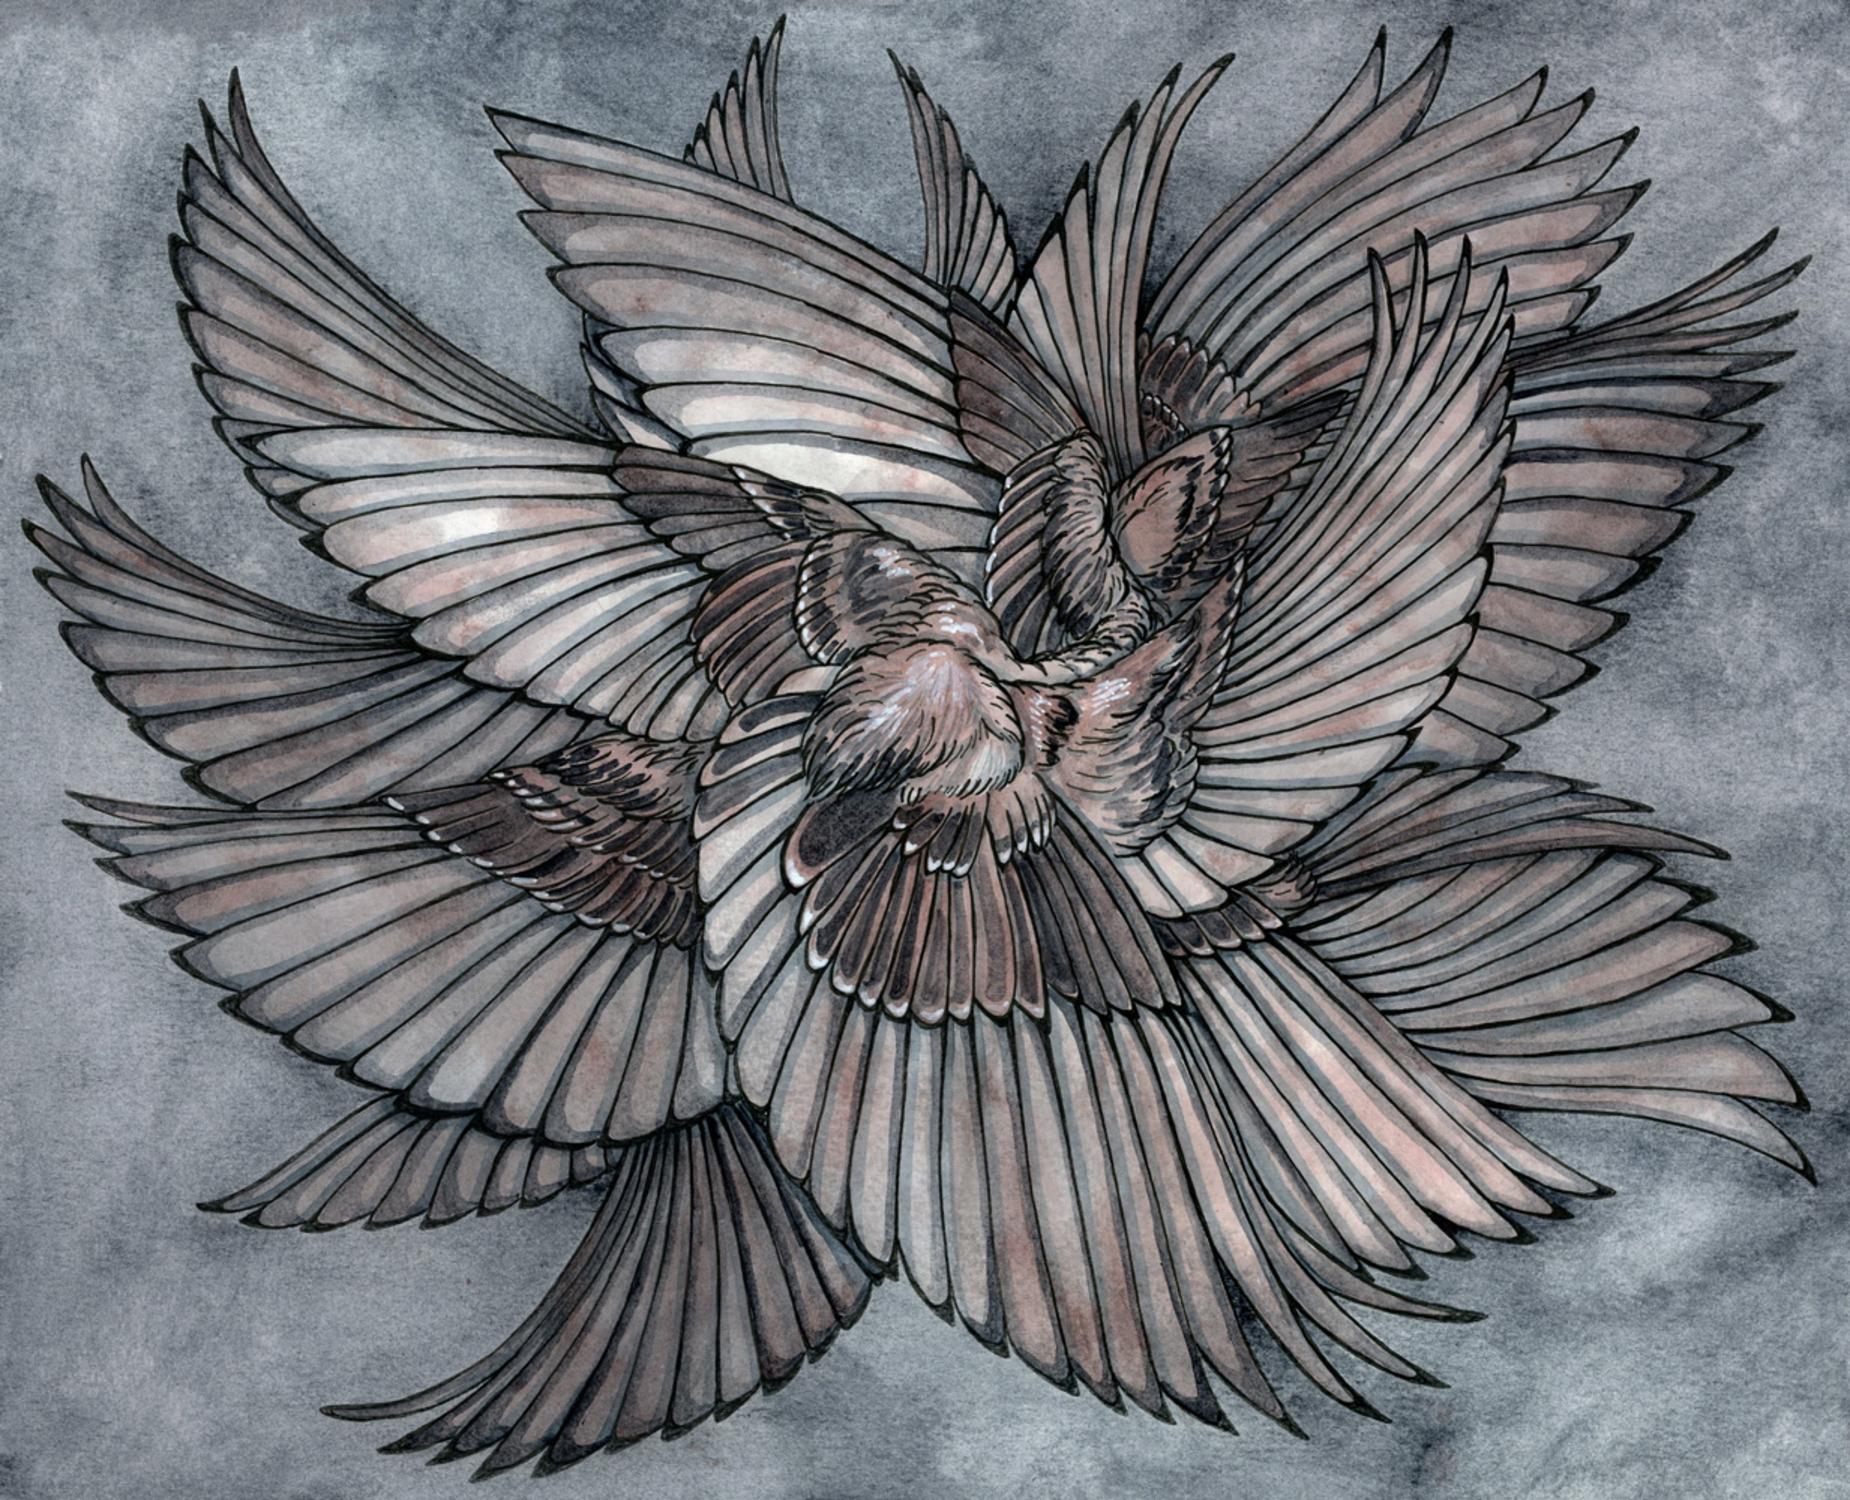 Paralysis Artwork by Rachel Quinlan